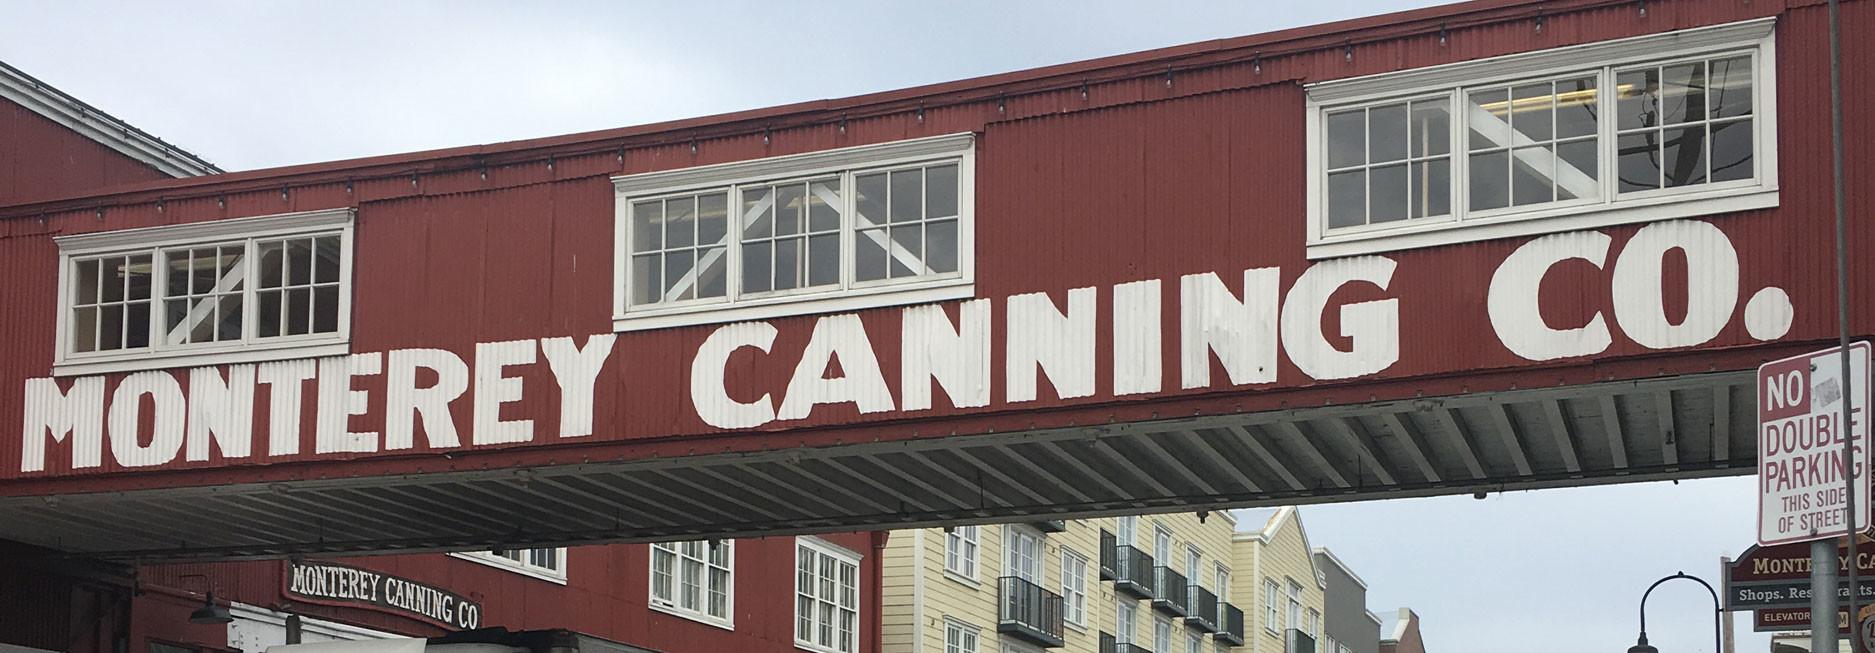 Reisebericht Kalifornien - Cannery Road in Monterey